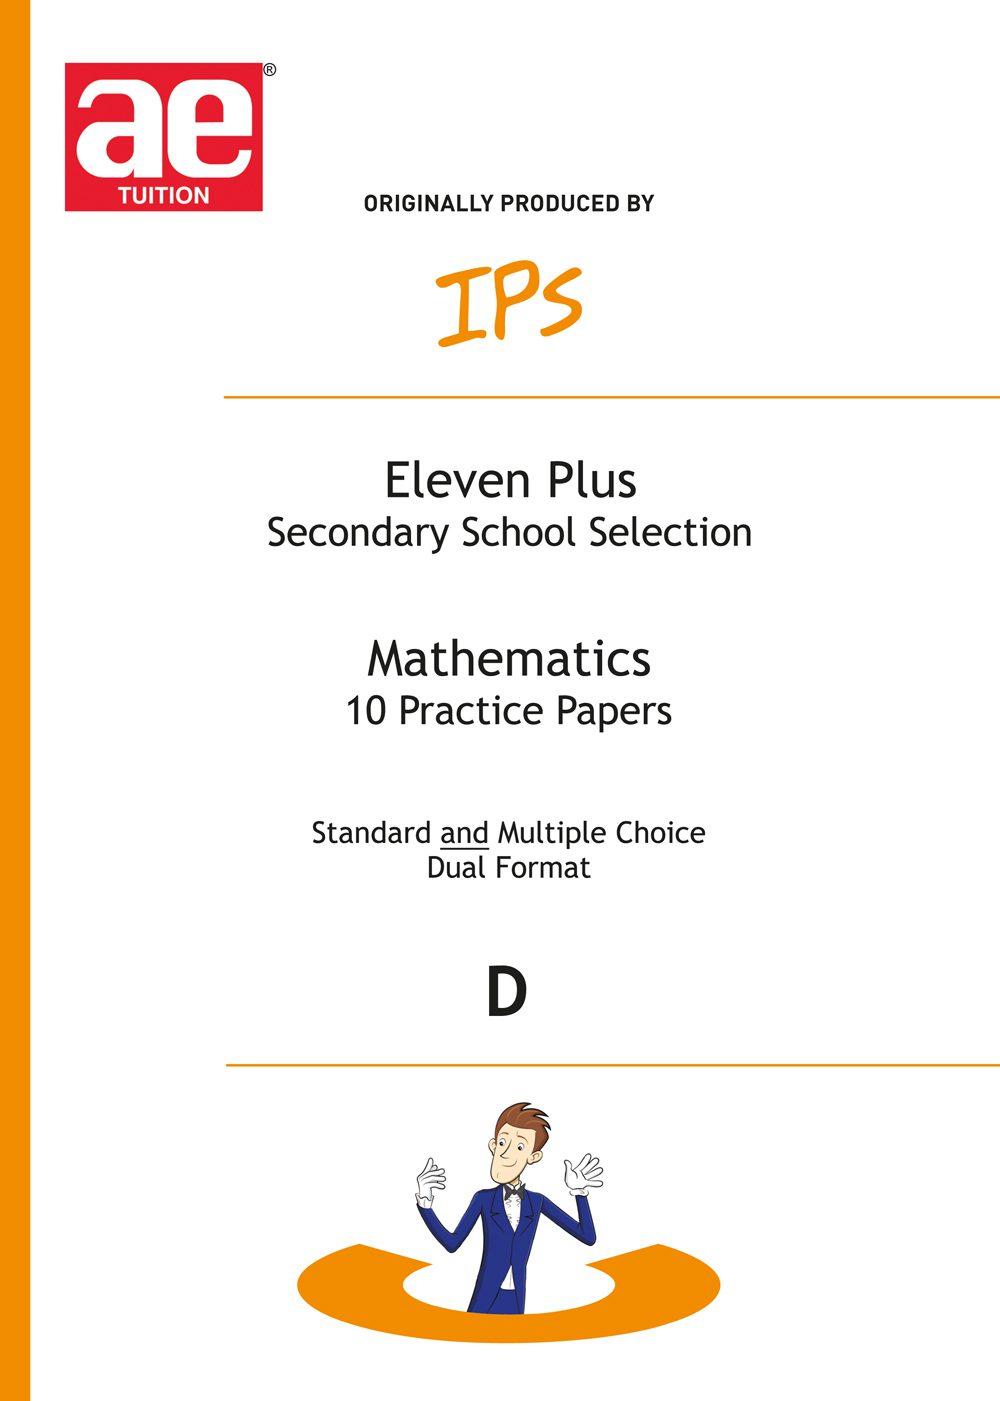 11 Plus Mathematics - Book D - 10 shorter practice papers (DF)